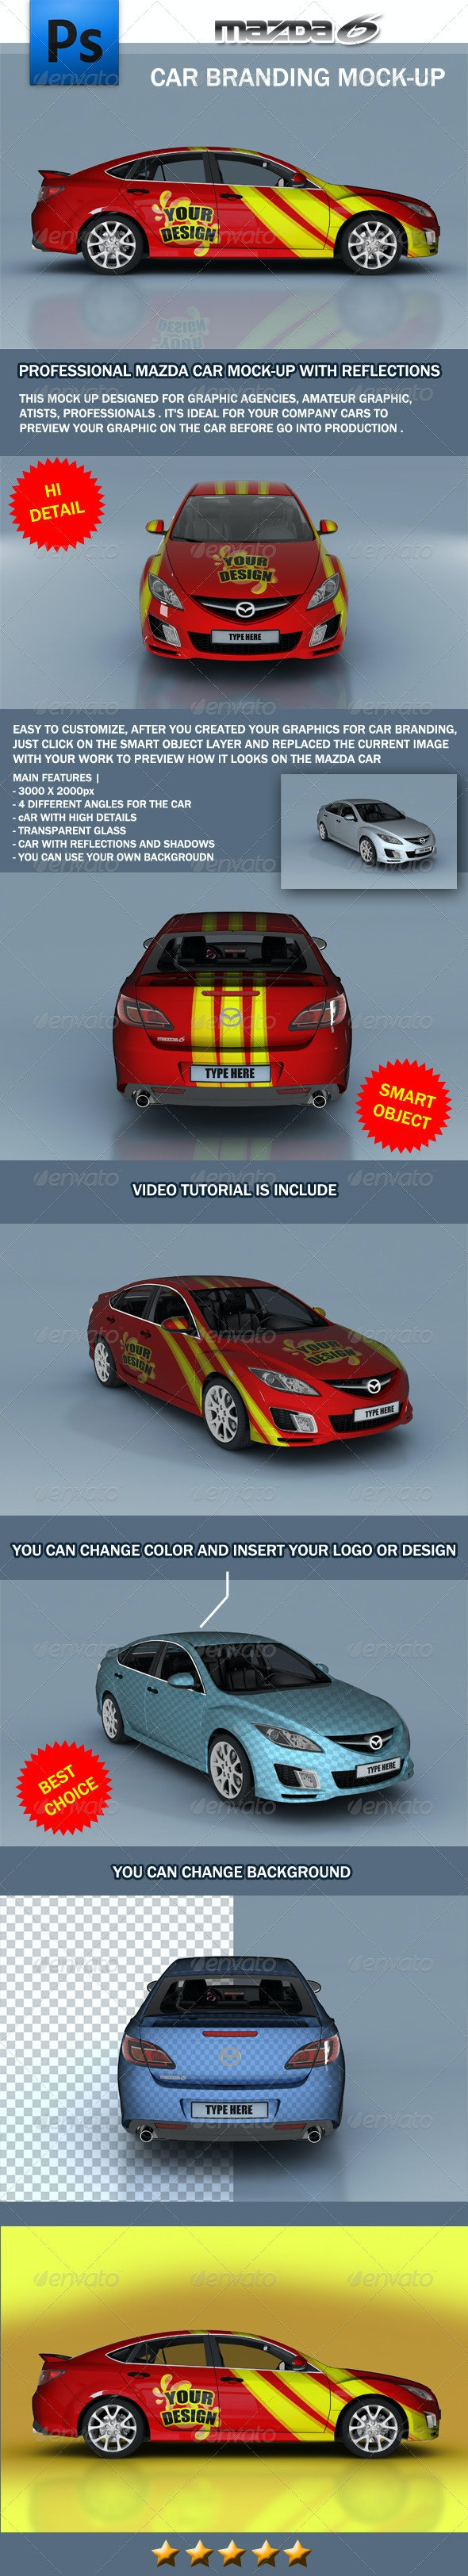 Mazda Car Branding Mock-up - Vehicle Wraps Print